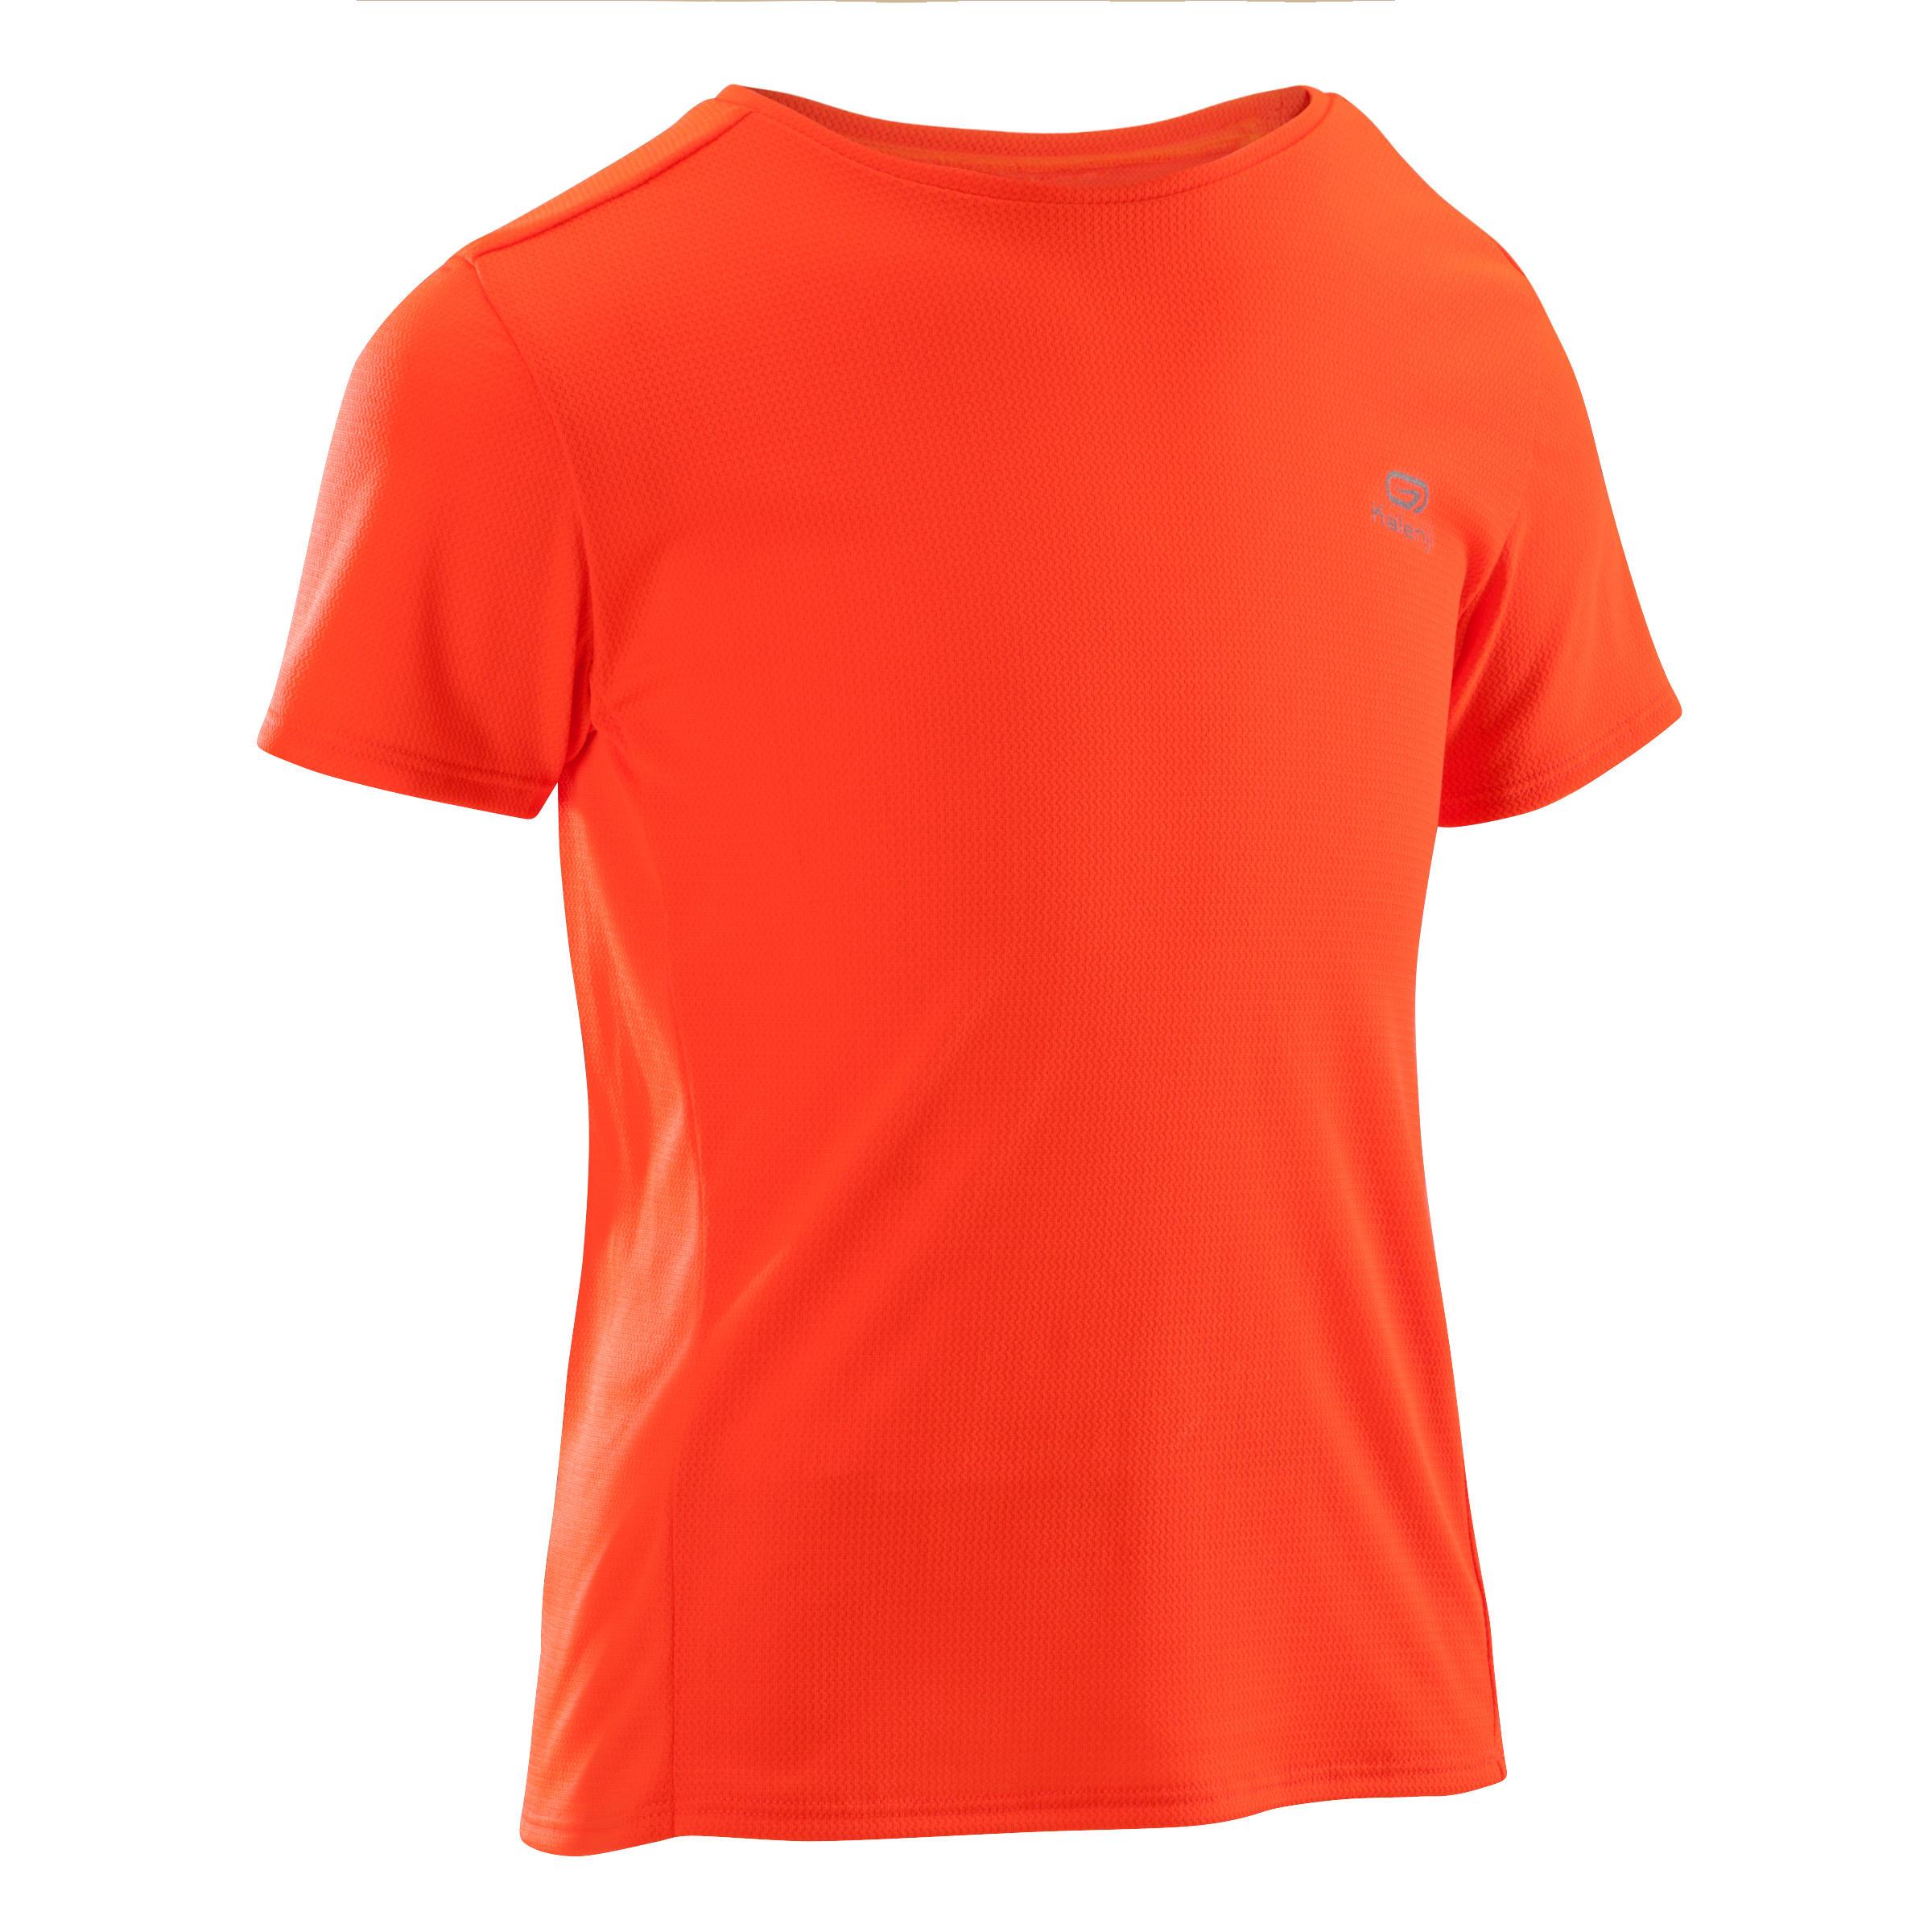 Camiseta de atletismo run dry niños roja flúor